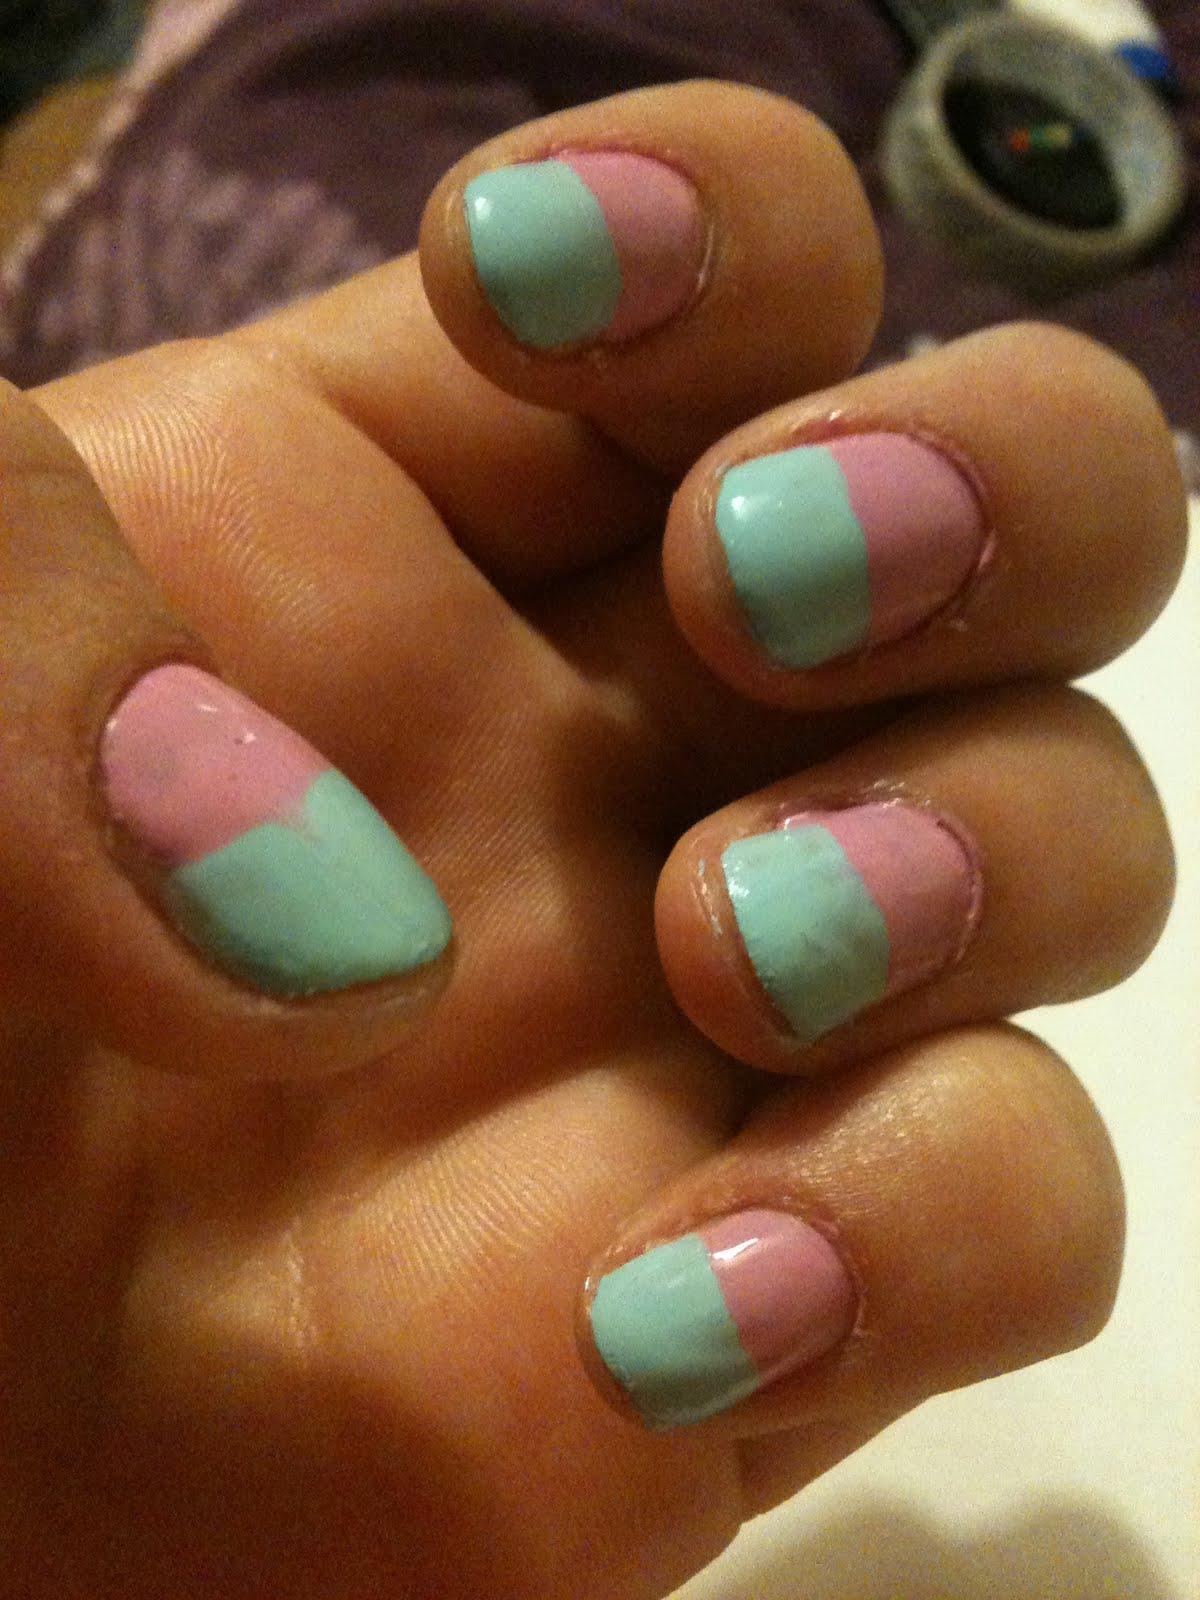 Little Spotty Dress: nail art.. gone wrong (: